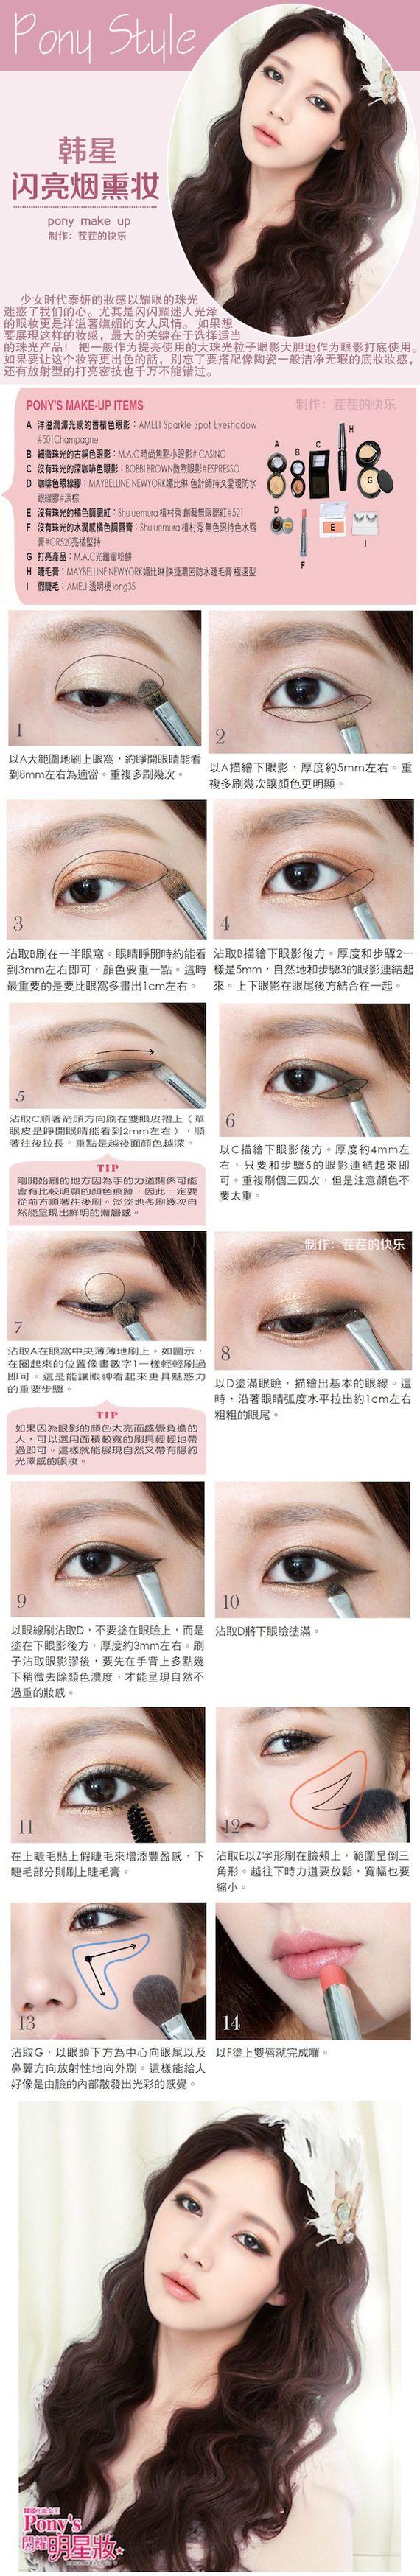 japanese/korean make up tutorial